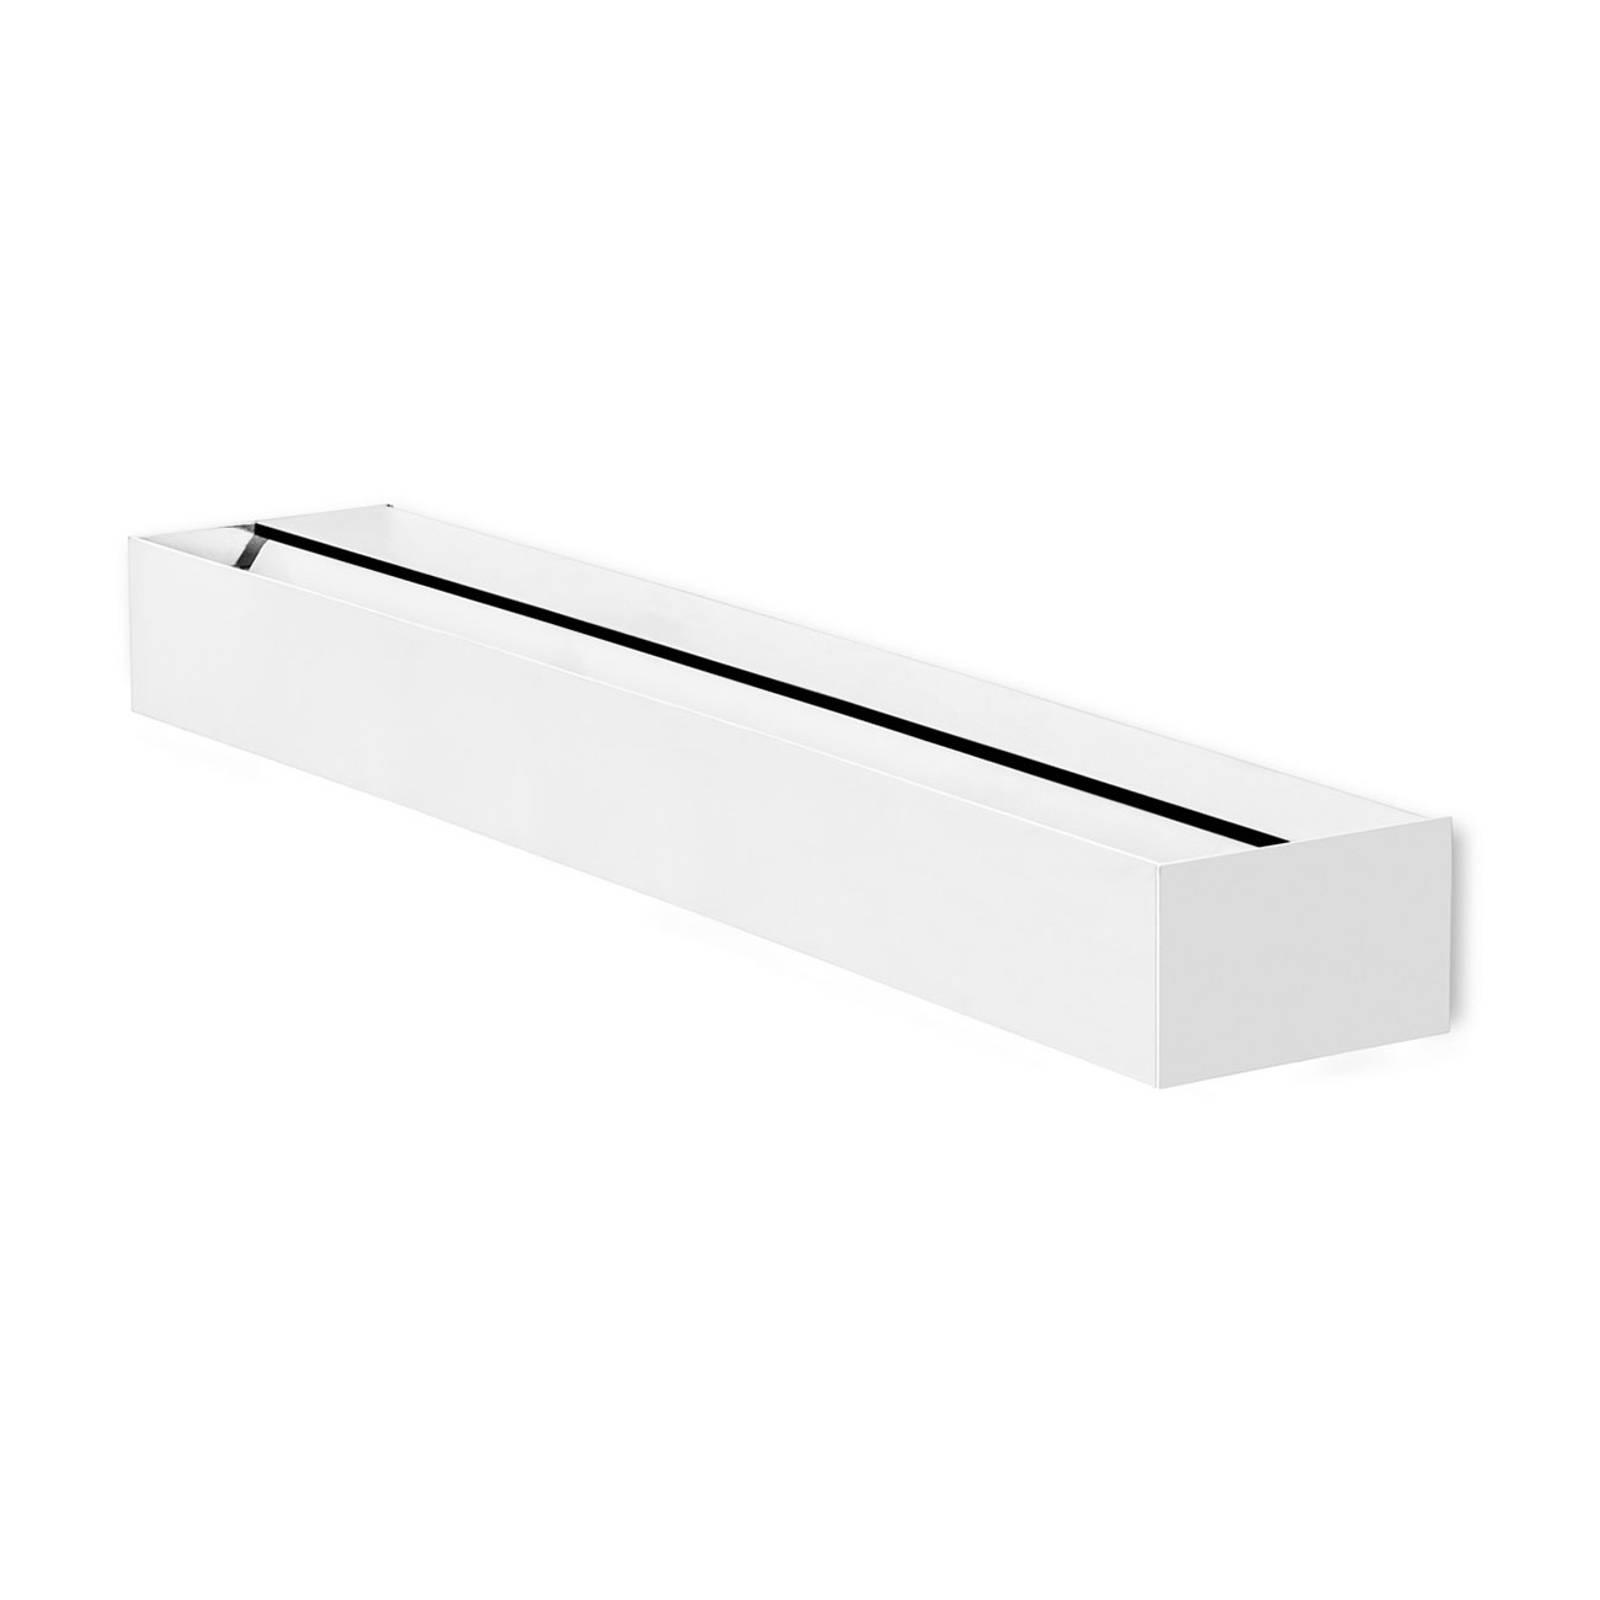 LEDS-C4 Lia -LED-seinävalaisin valkoinen 60 cm